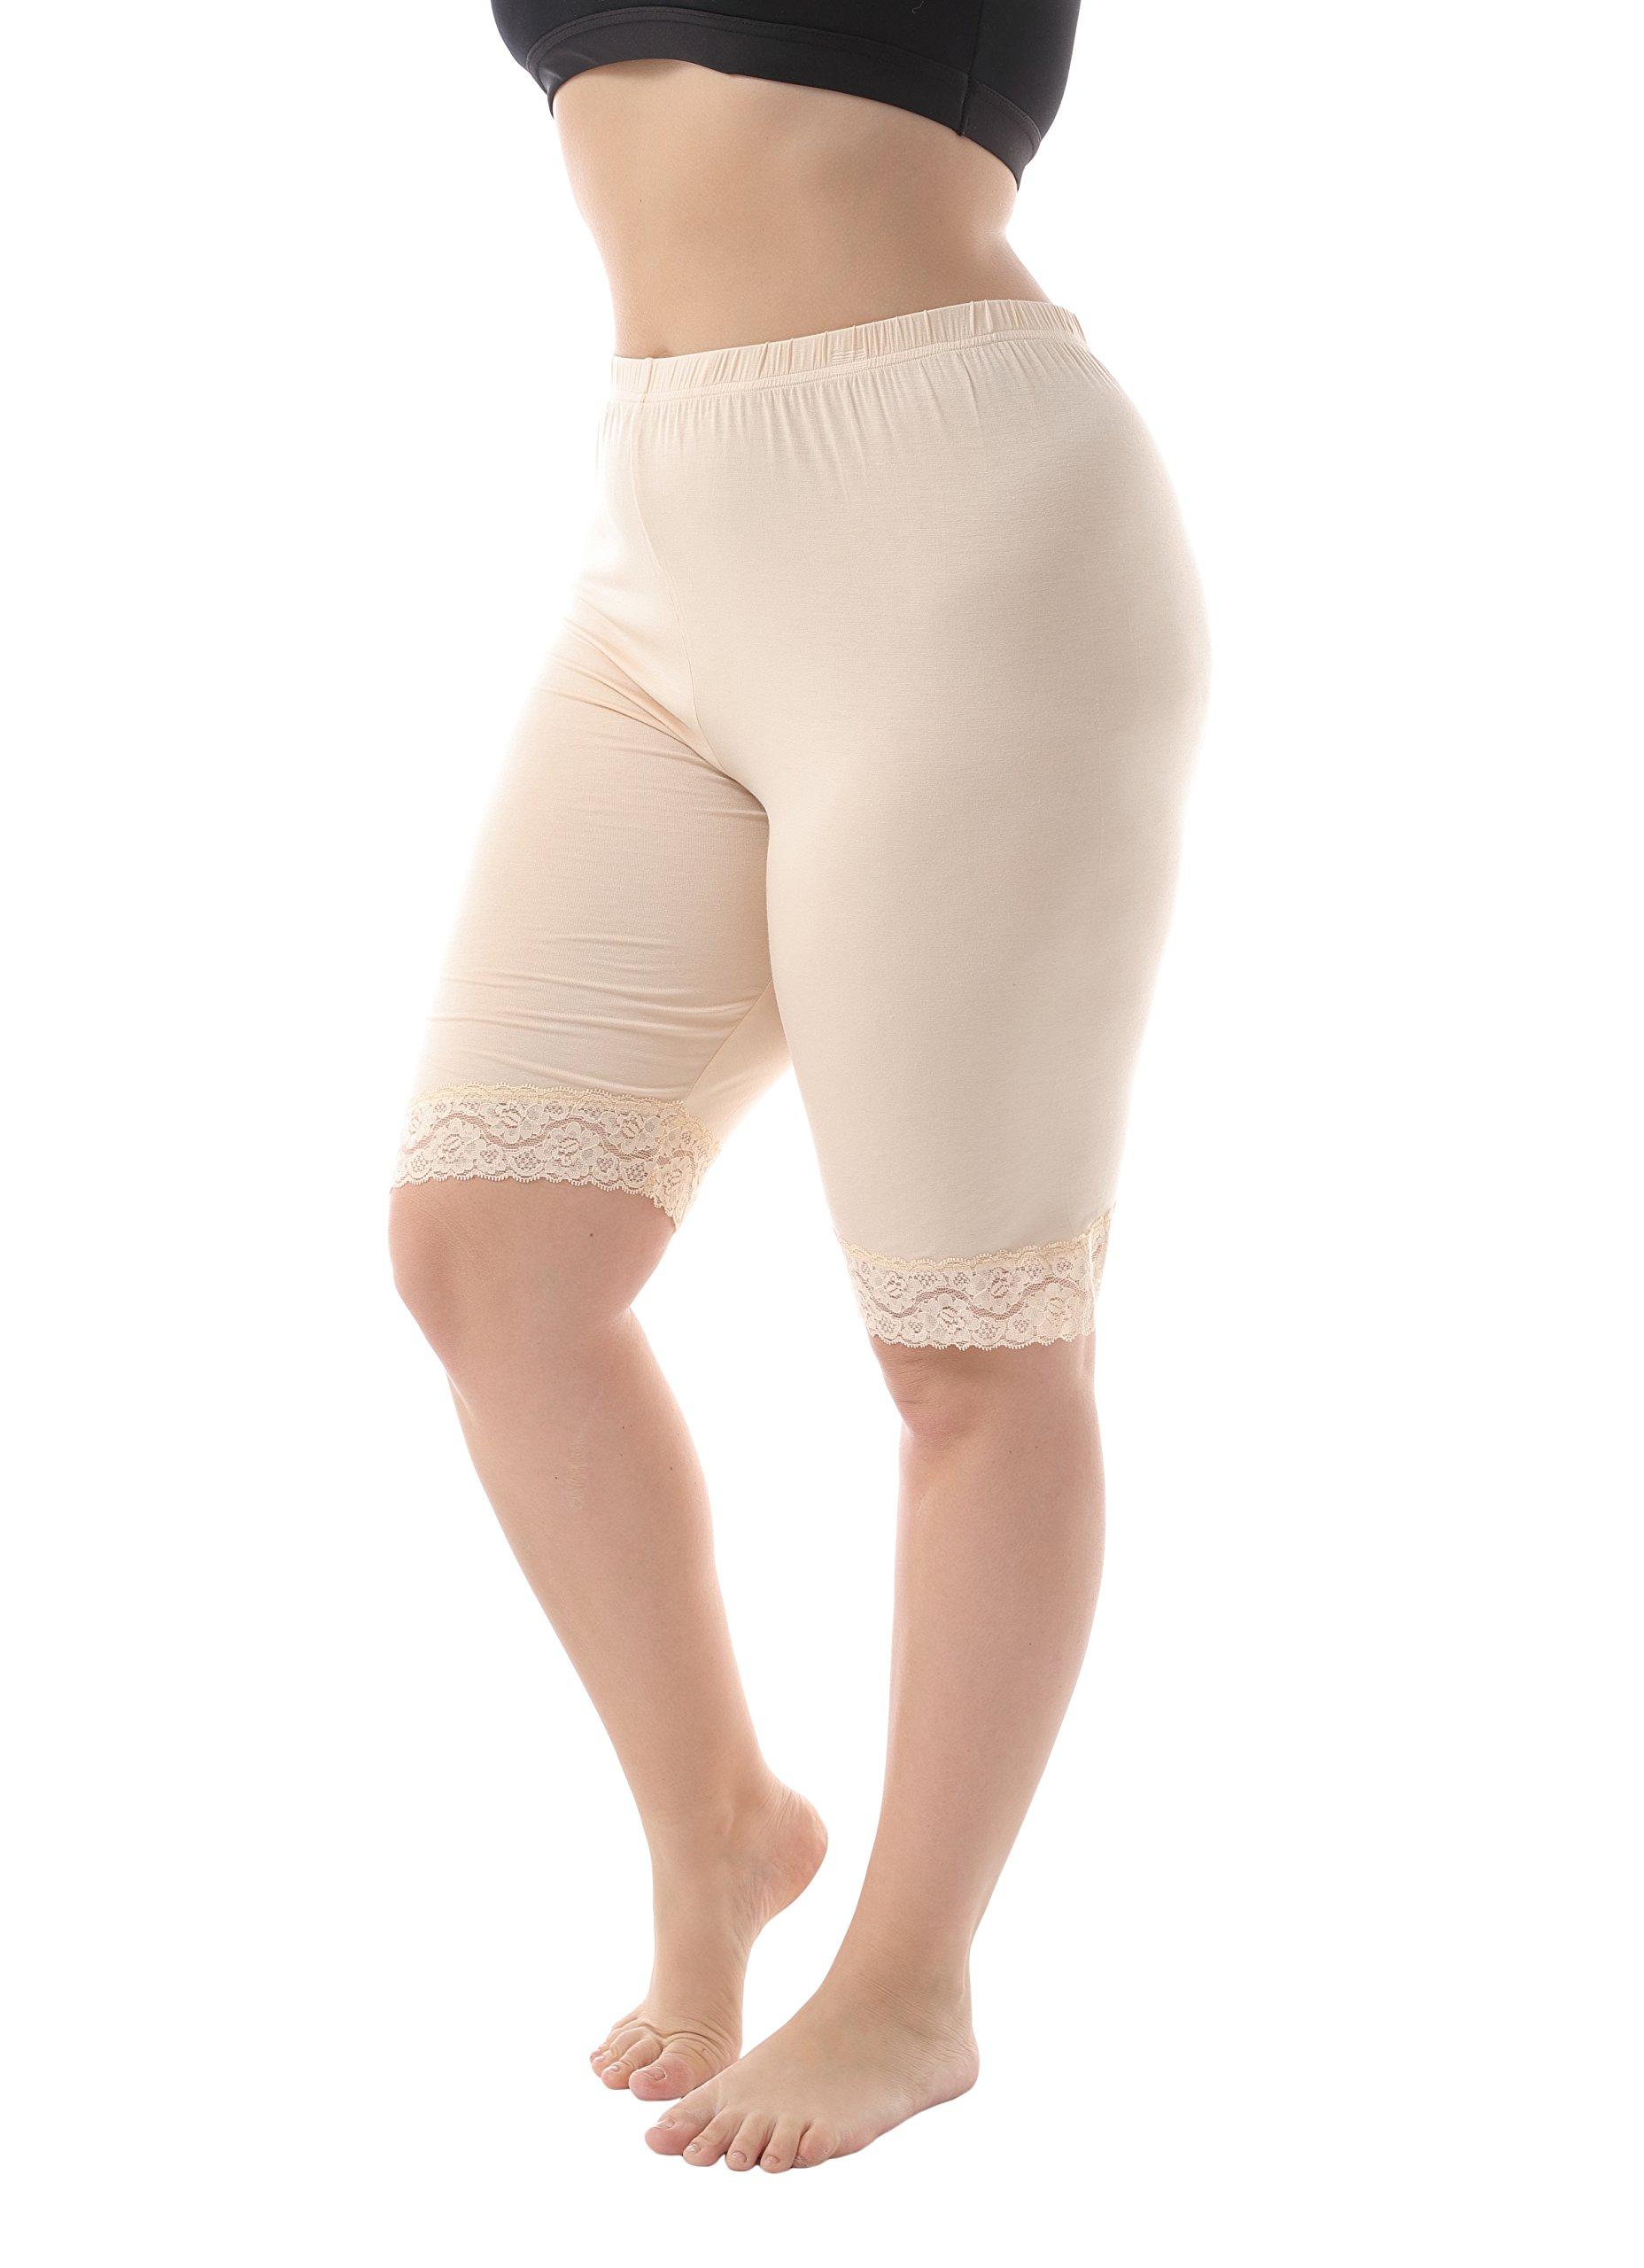 ZERDOCEAN Women's Plus Size Modal Basic Mid Thigh Short Leggings with Lace Trim Khaki 4X